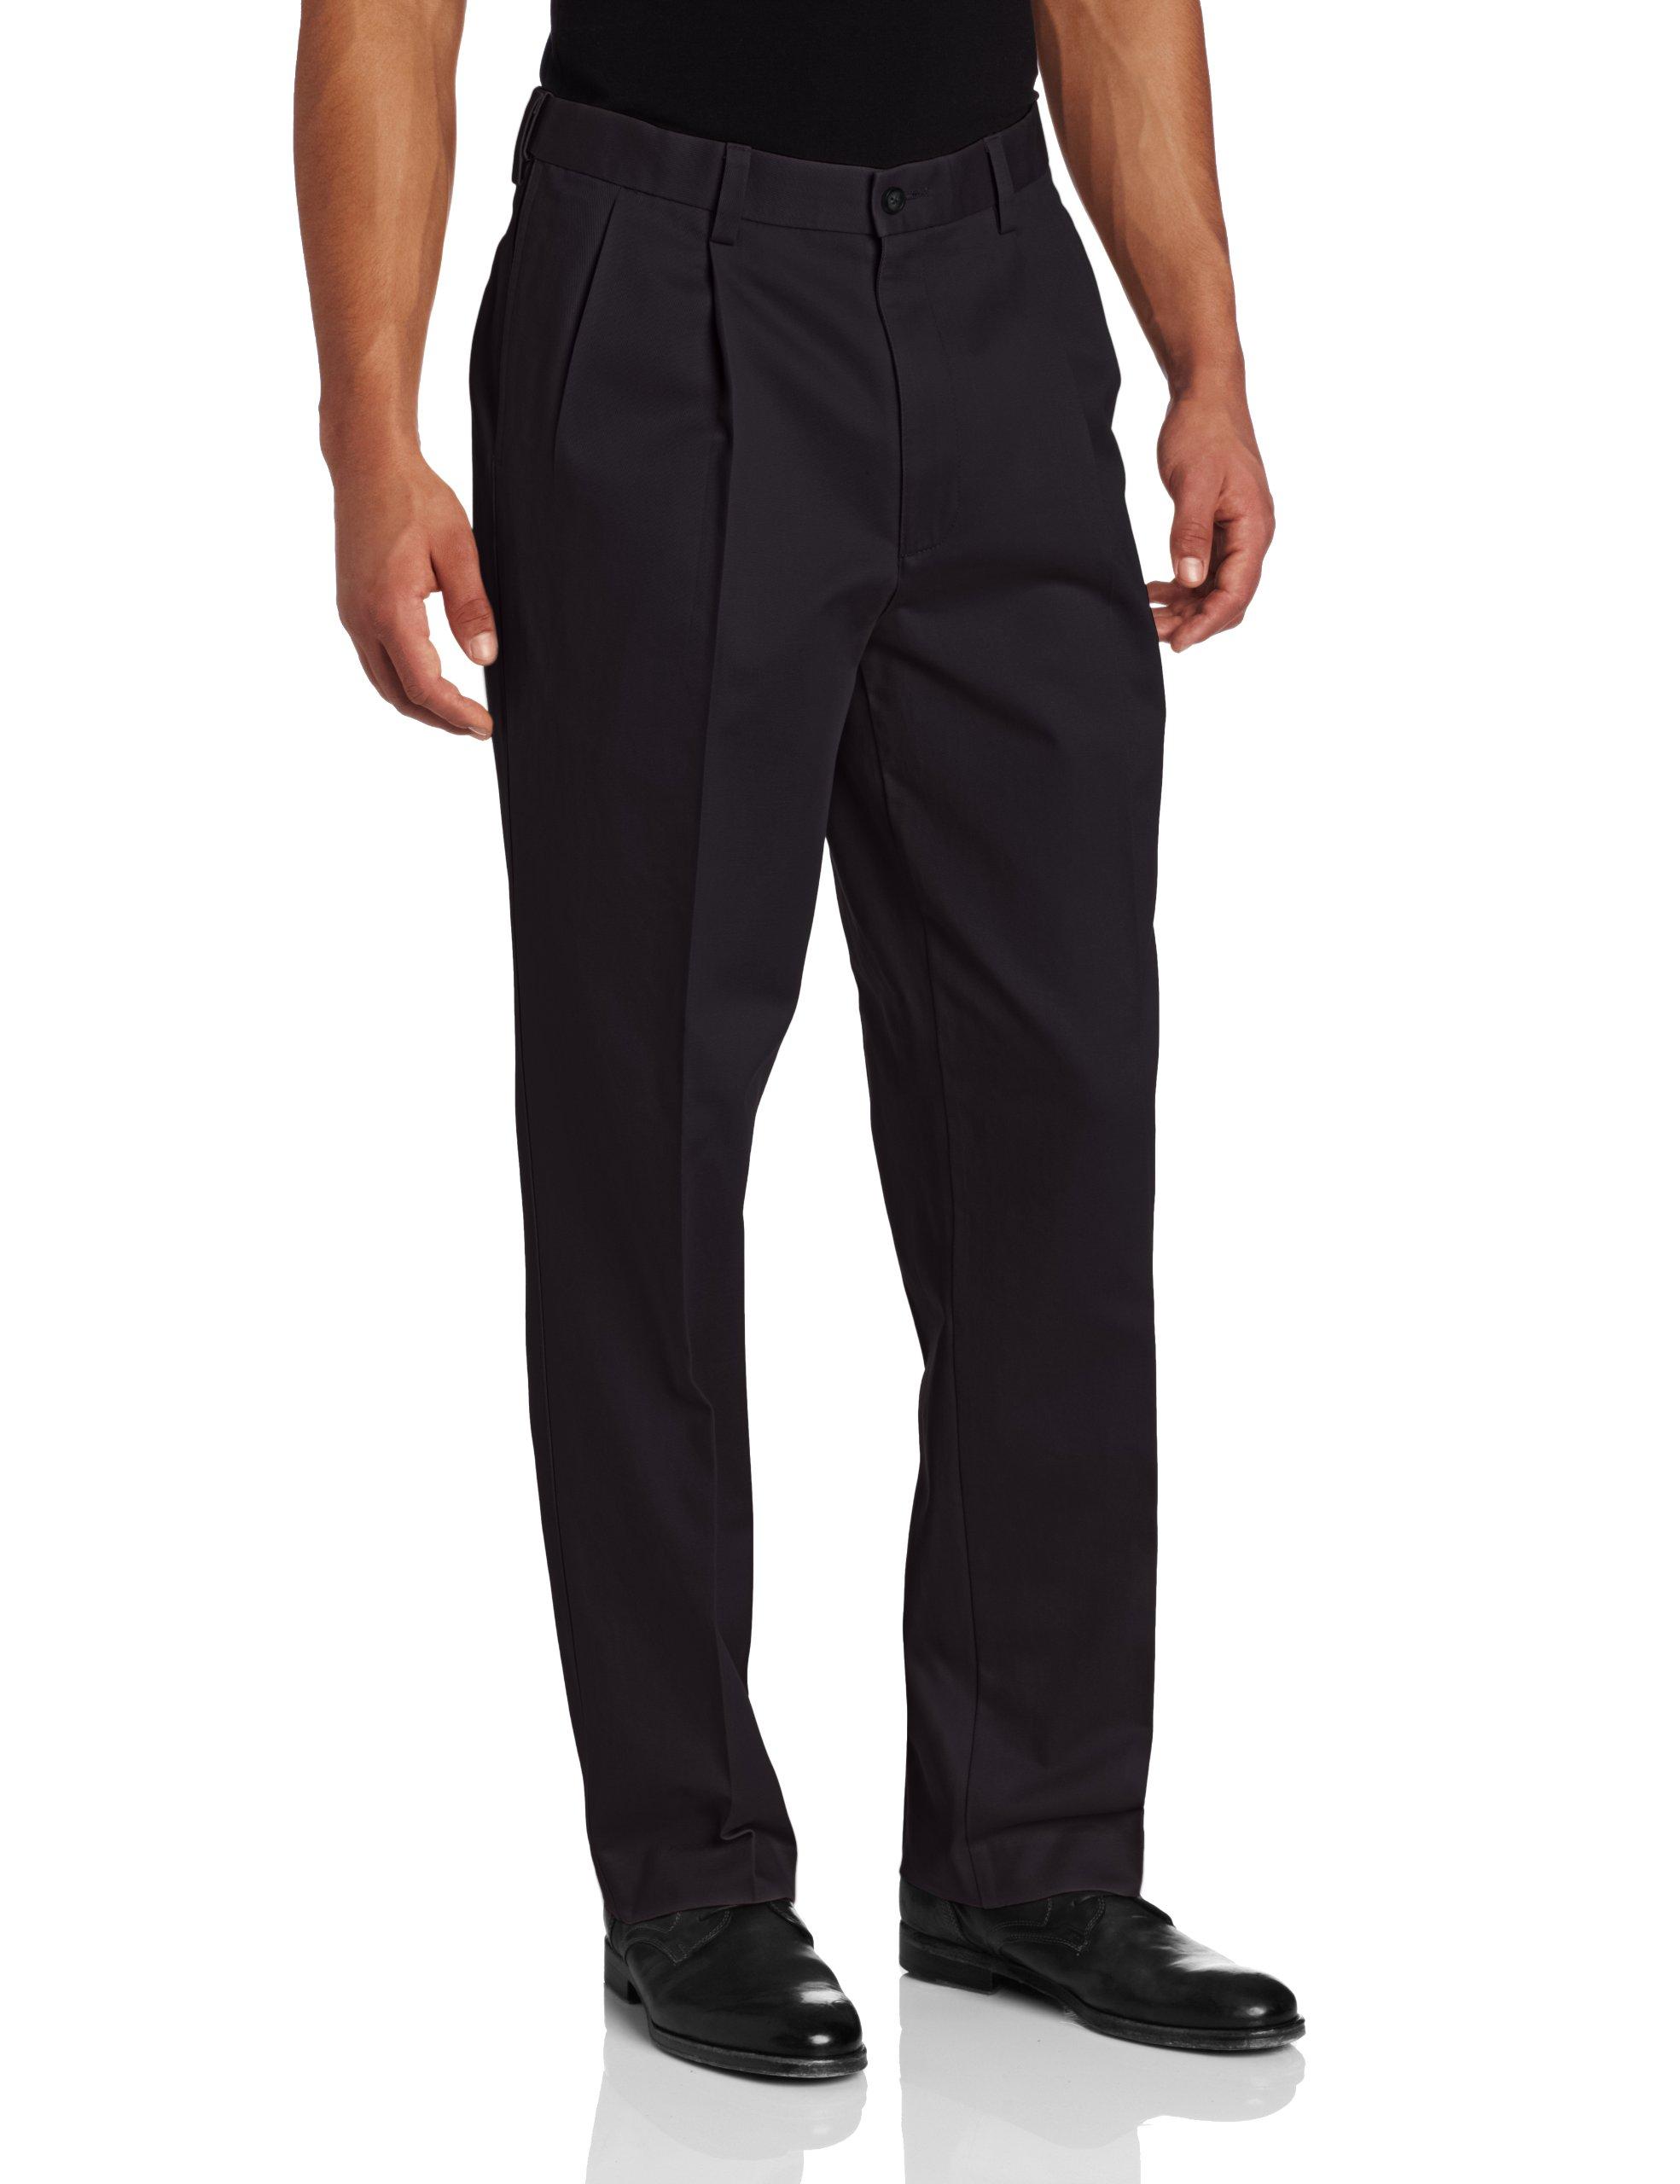 Savane Men's Pleated Performance Chino Pant, Classic Navy, 38W x 30L